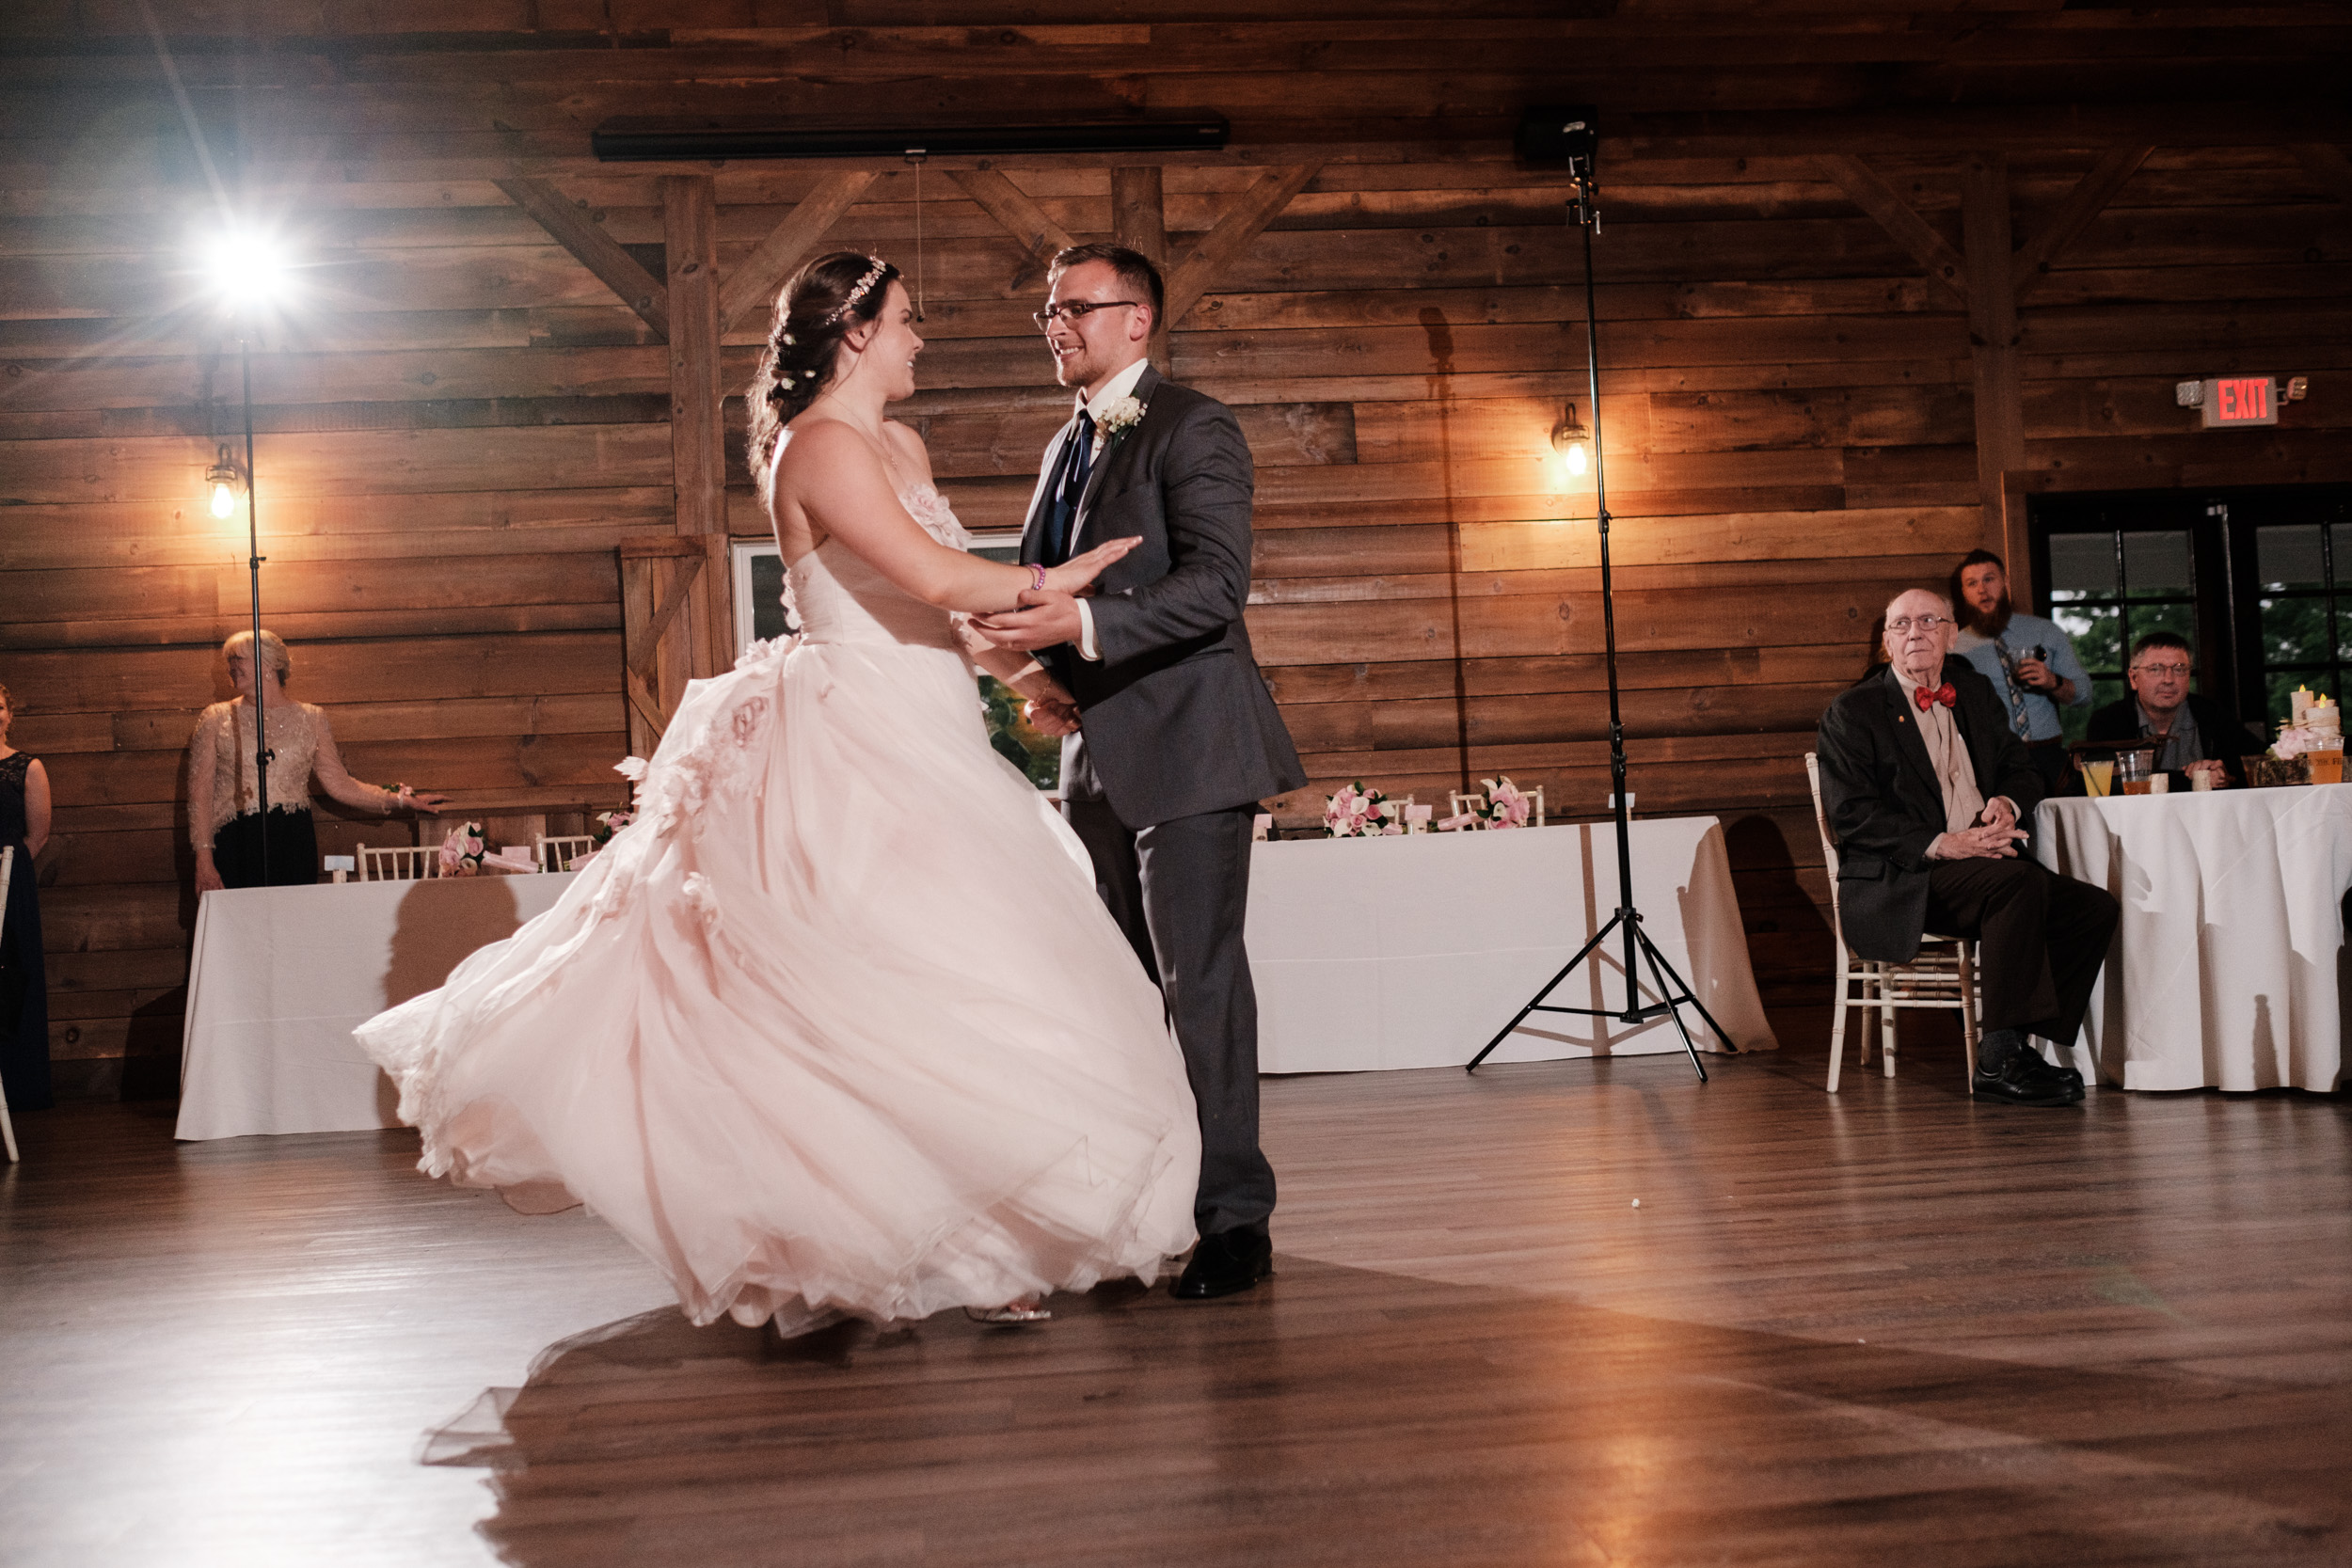 19-06-22-Ryan-Katie-The-Fields-Reserve-Wedding-75.jpg